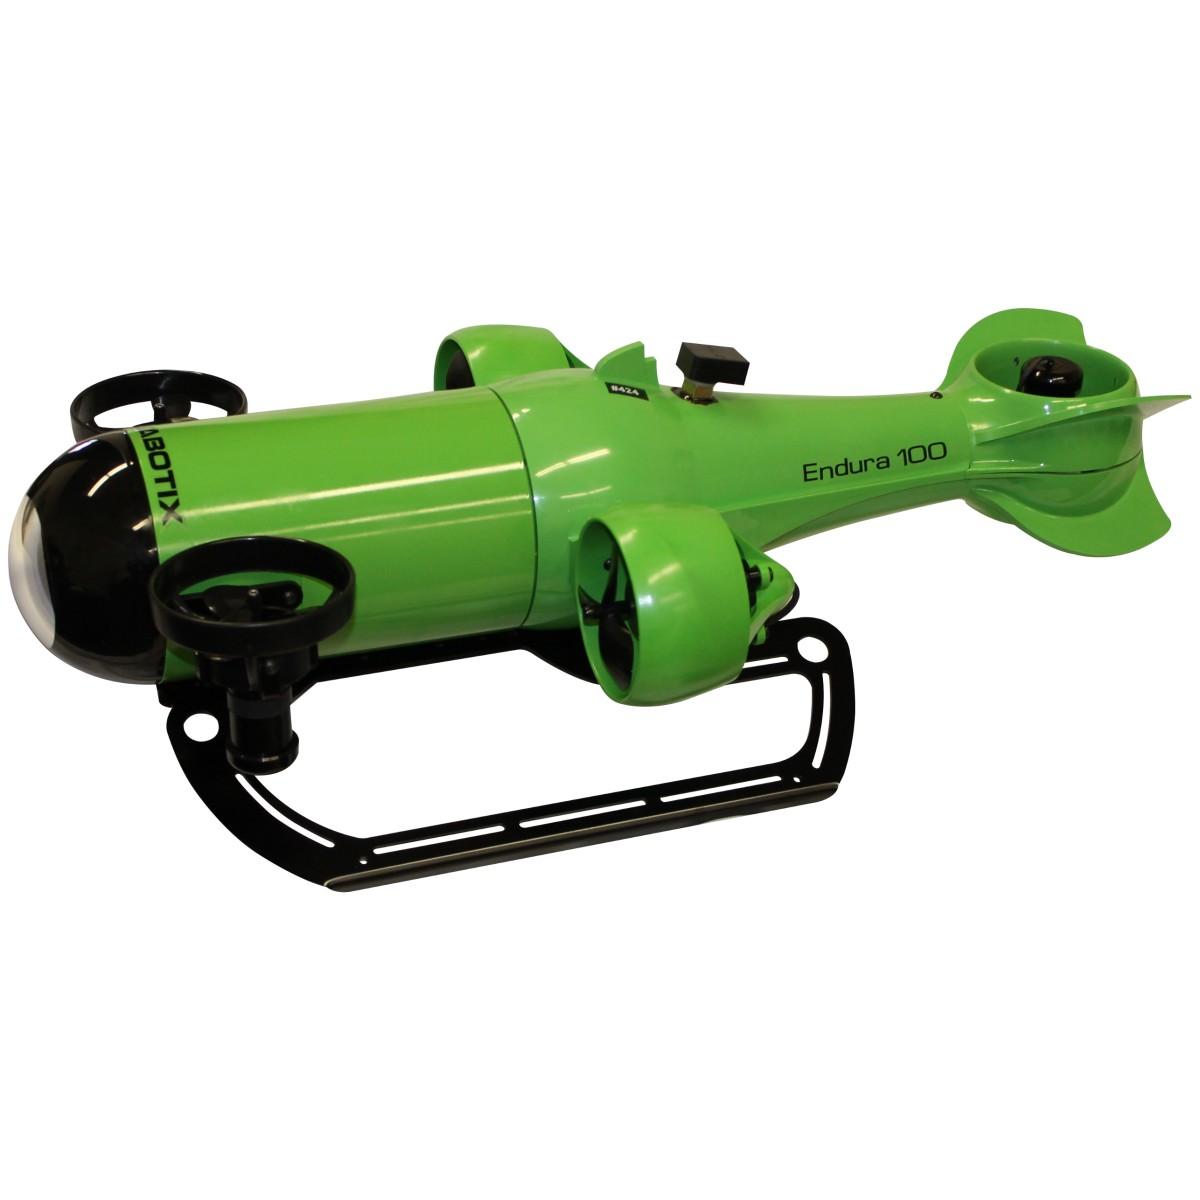 Aquabotix Endura 100 ROV Water Inspection